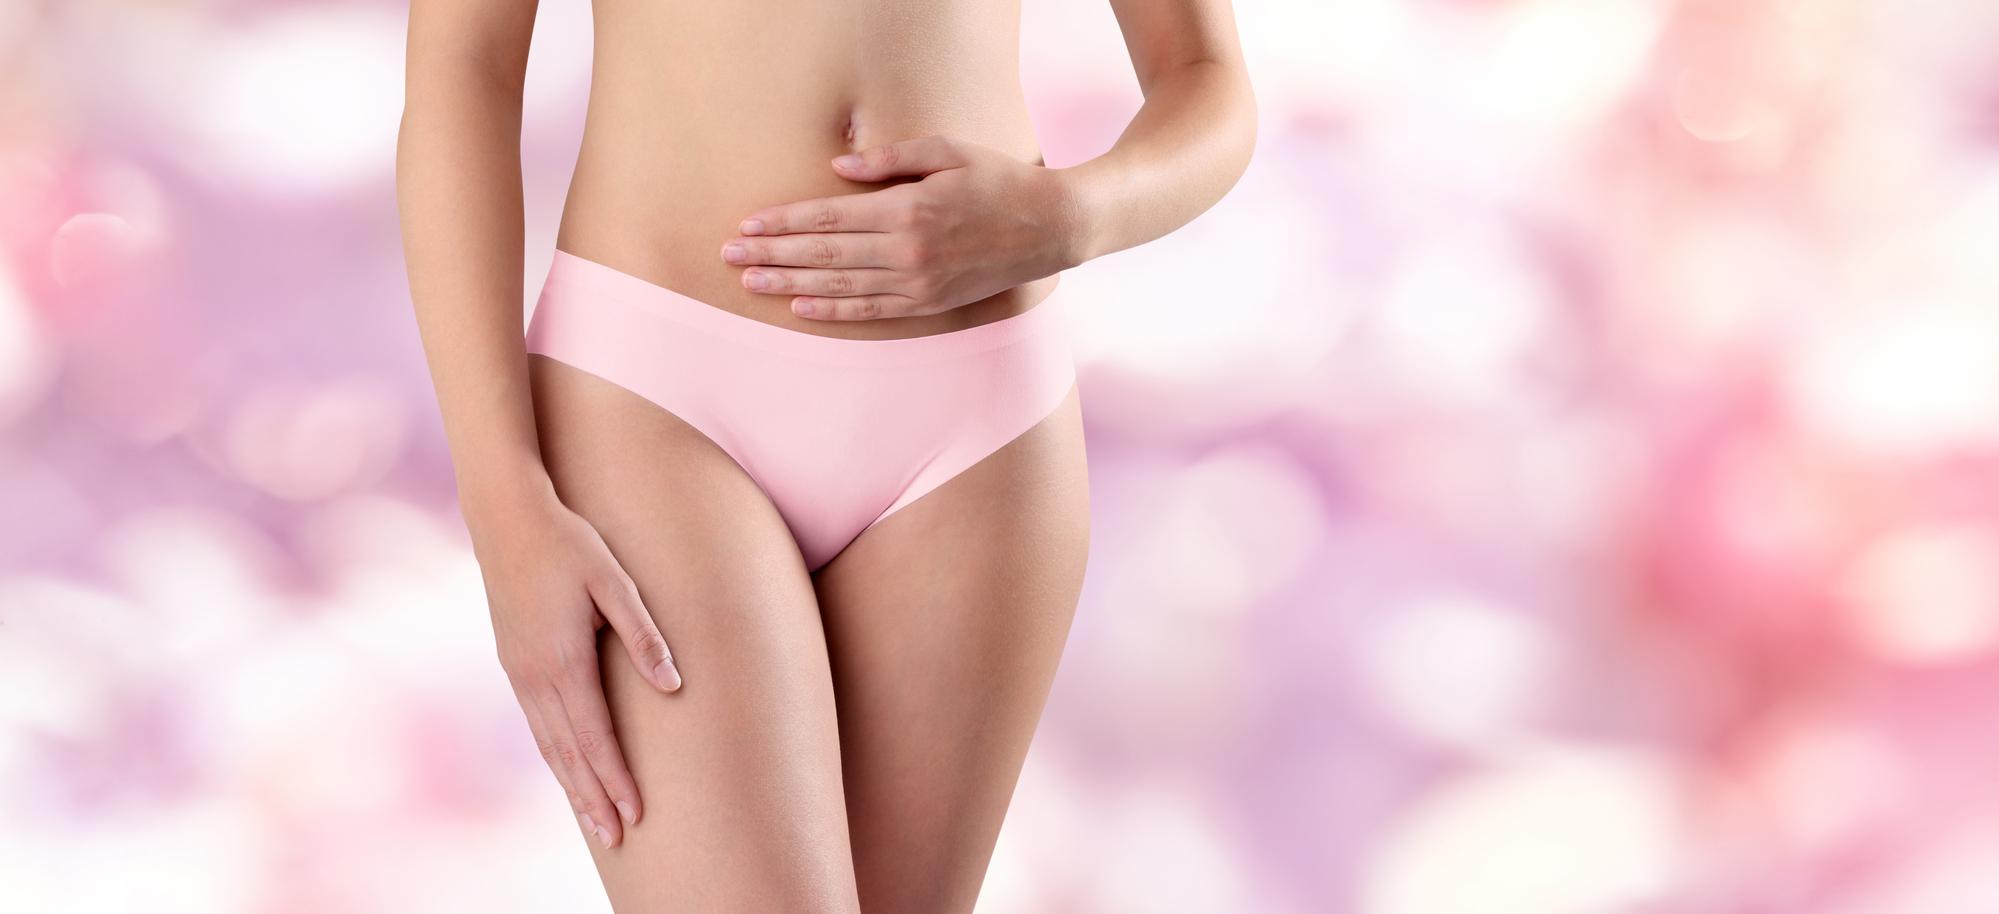 Progesteronmangel - So stellen Sie diesen fest